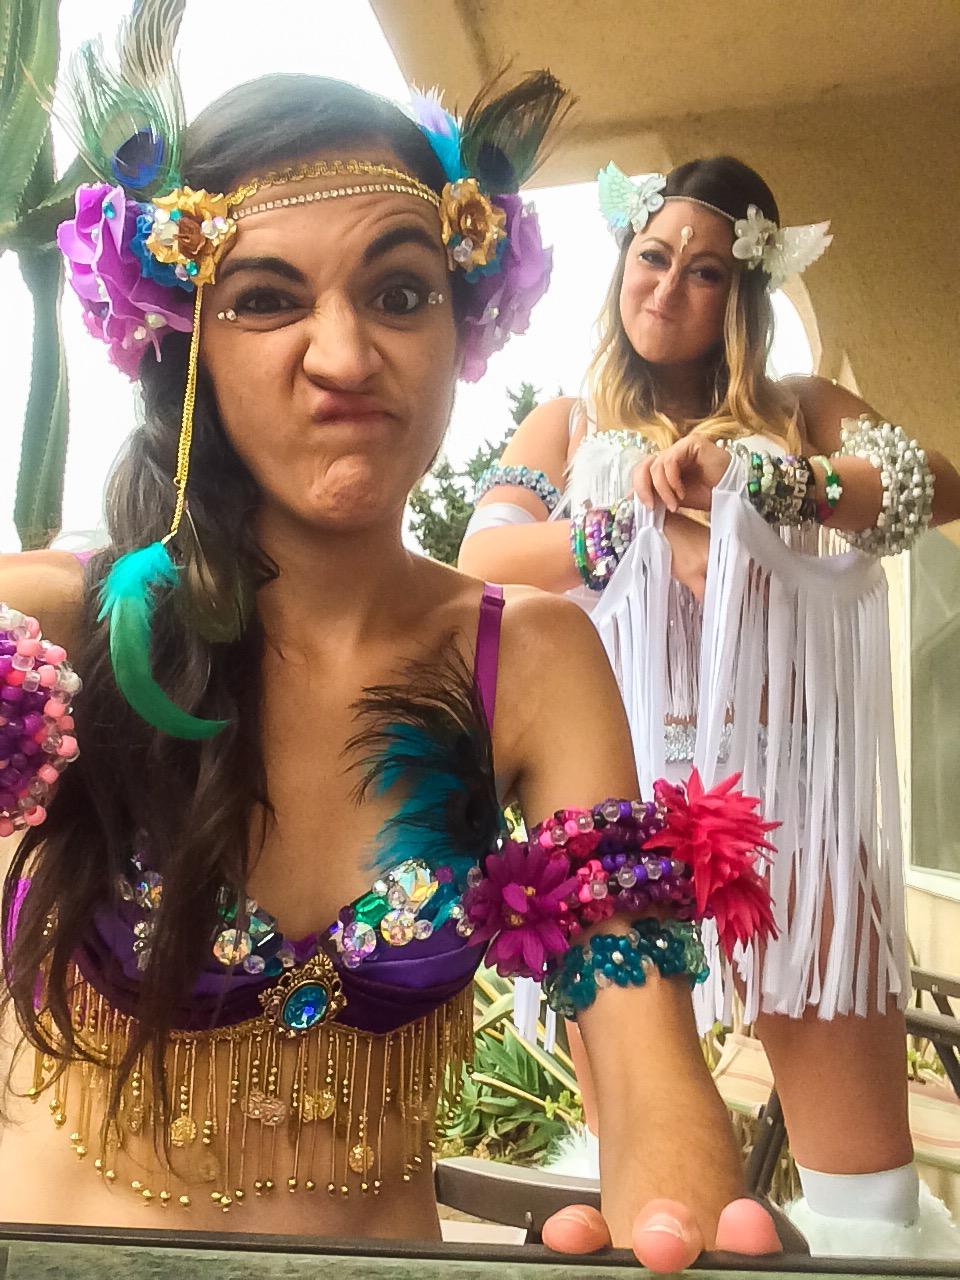 Kaitlynaka  edmHumor  with her Gf Claudia aka  Rave Selfies.